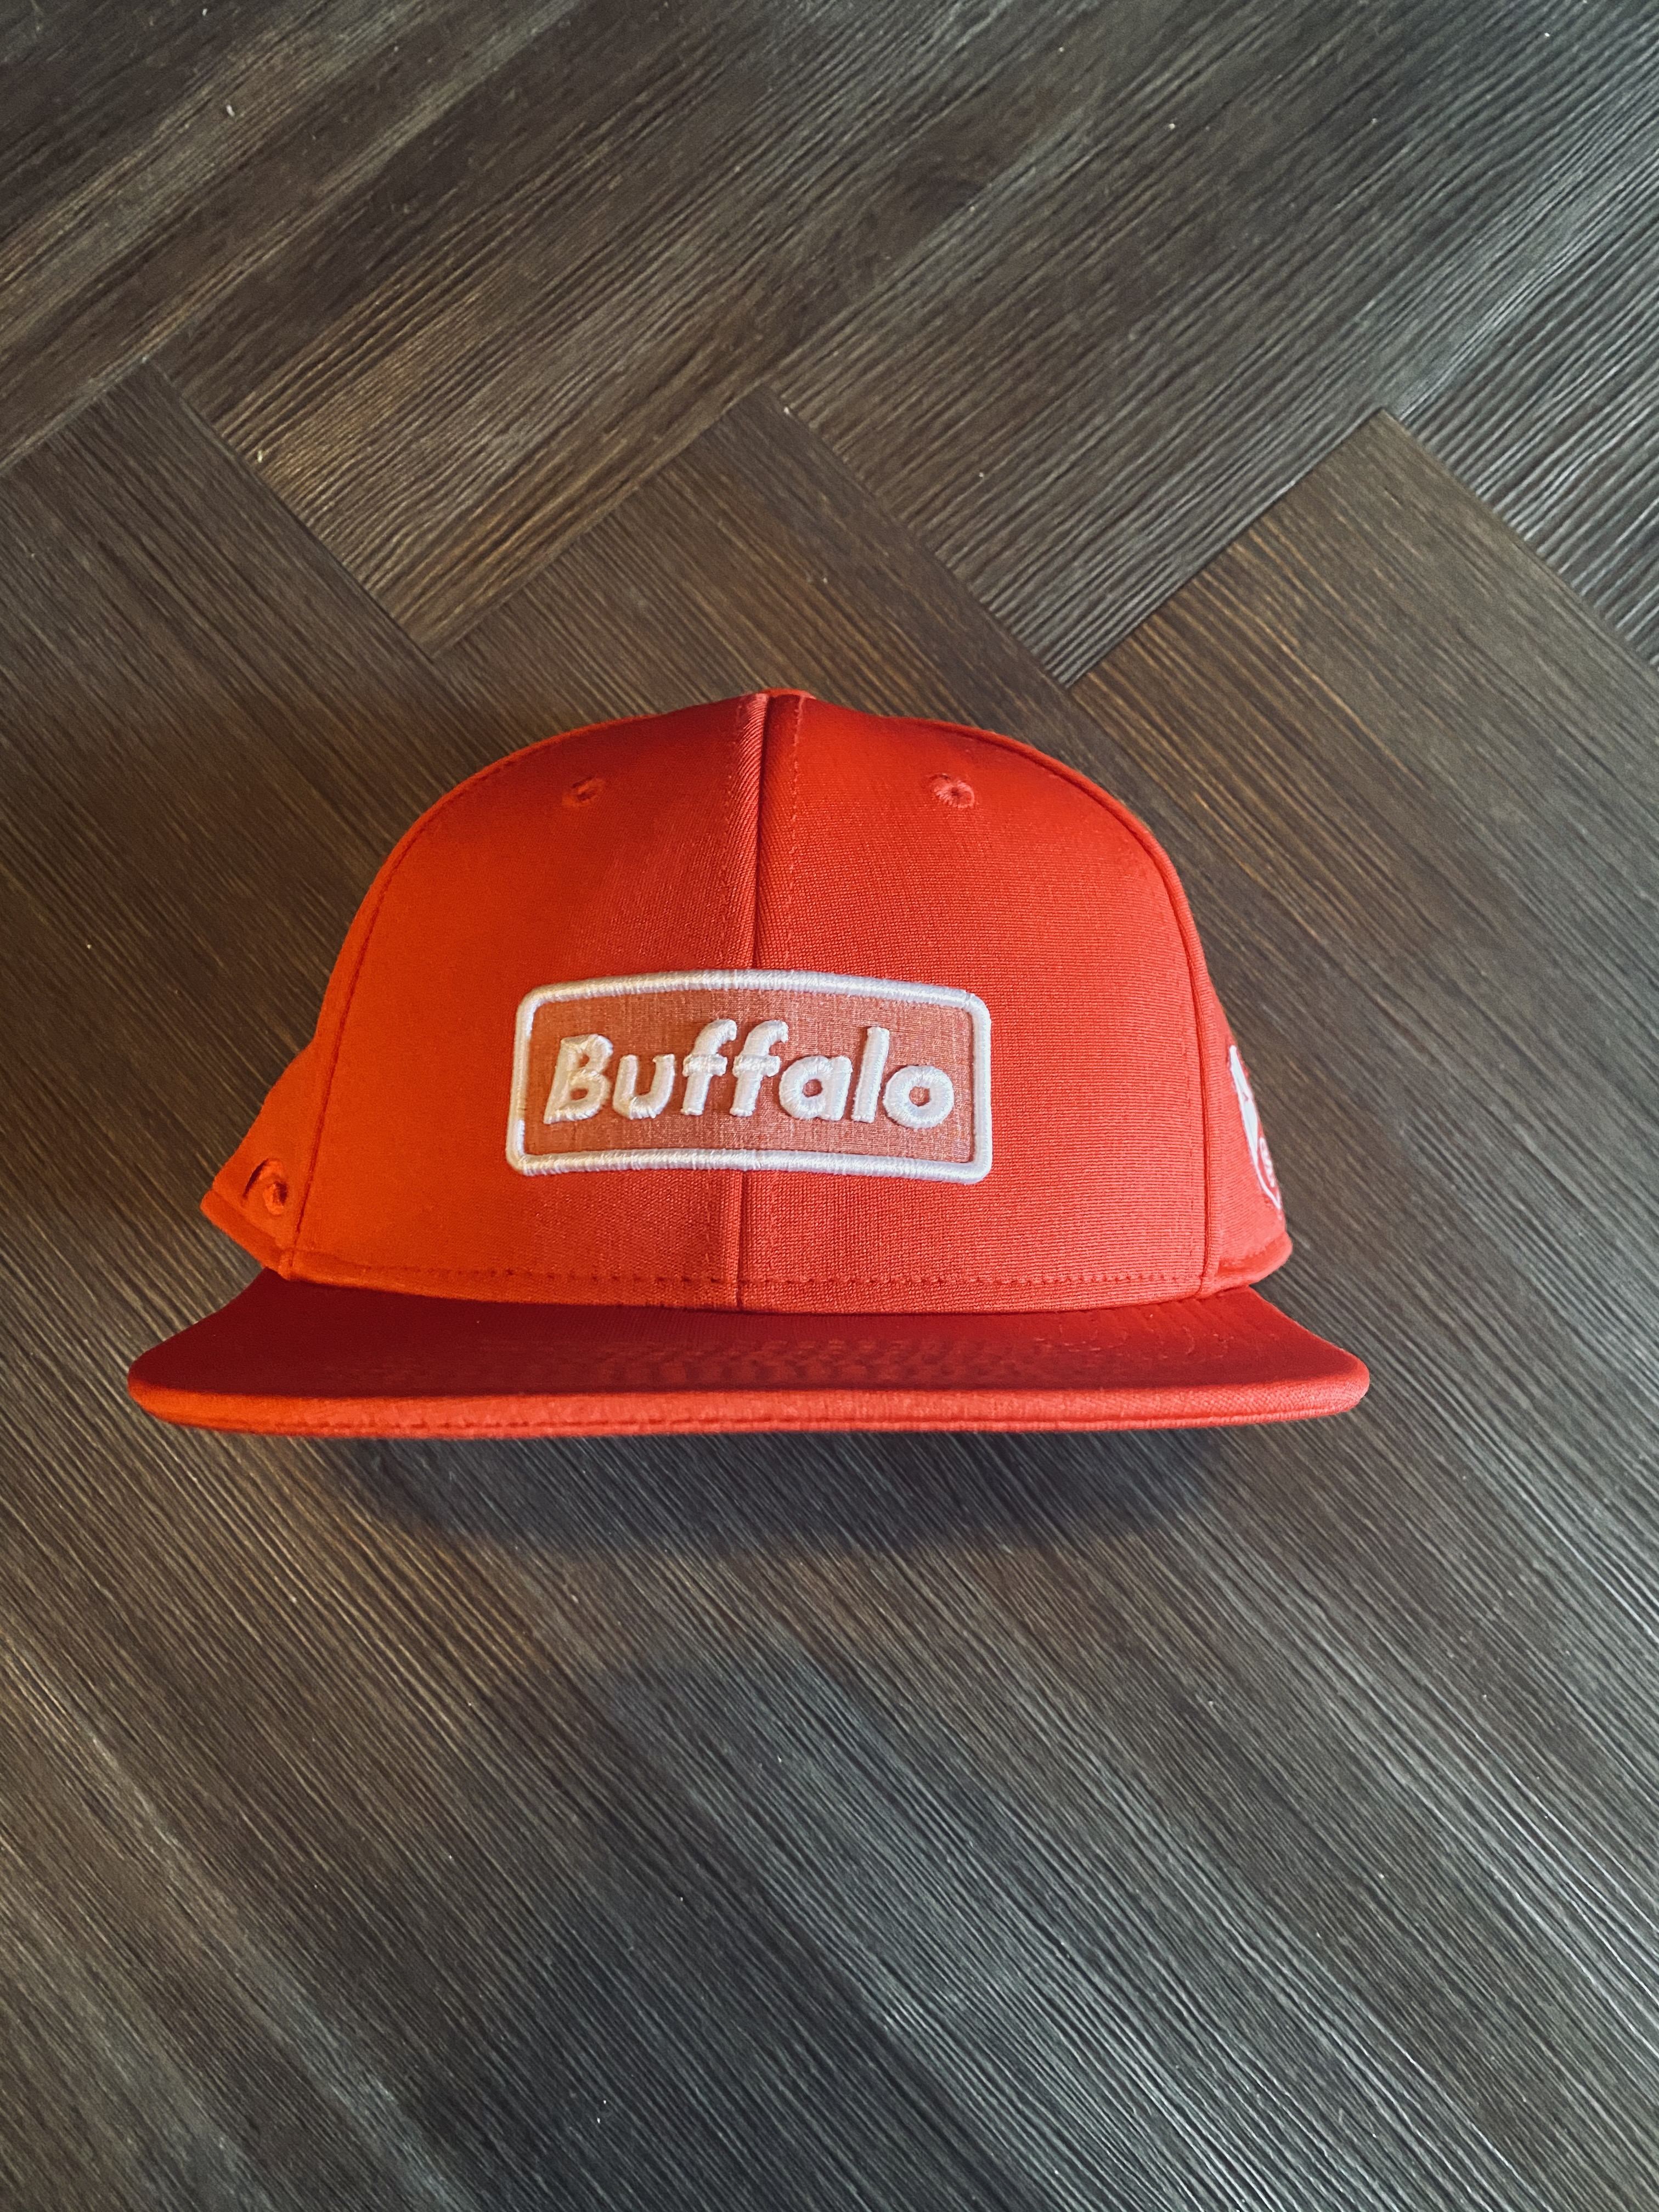 Buffalo Supreme Hat (Red)